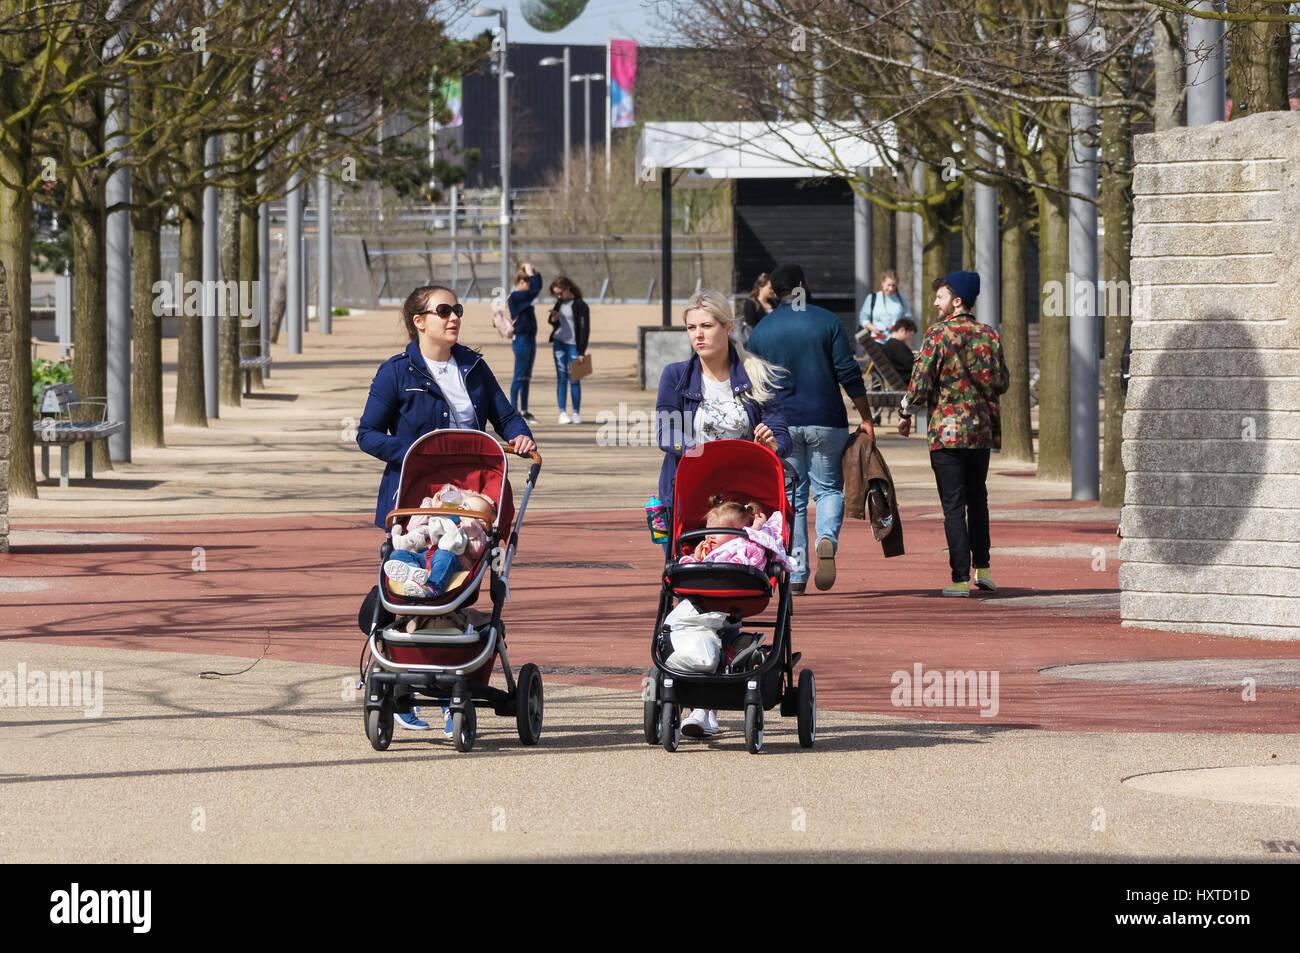 People enjoy sunny day at the Queen Elizabeth Olympic Park, London England United Kingdom UK - Stock Image